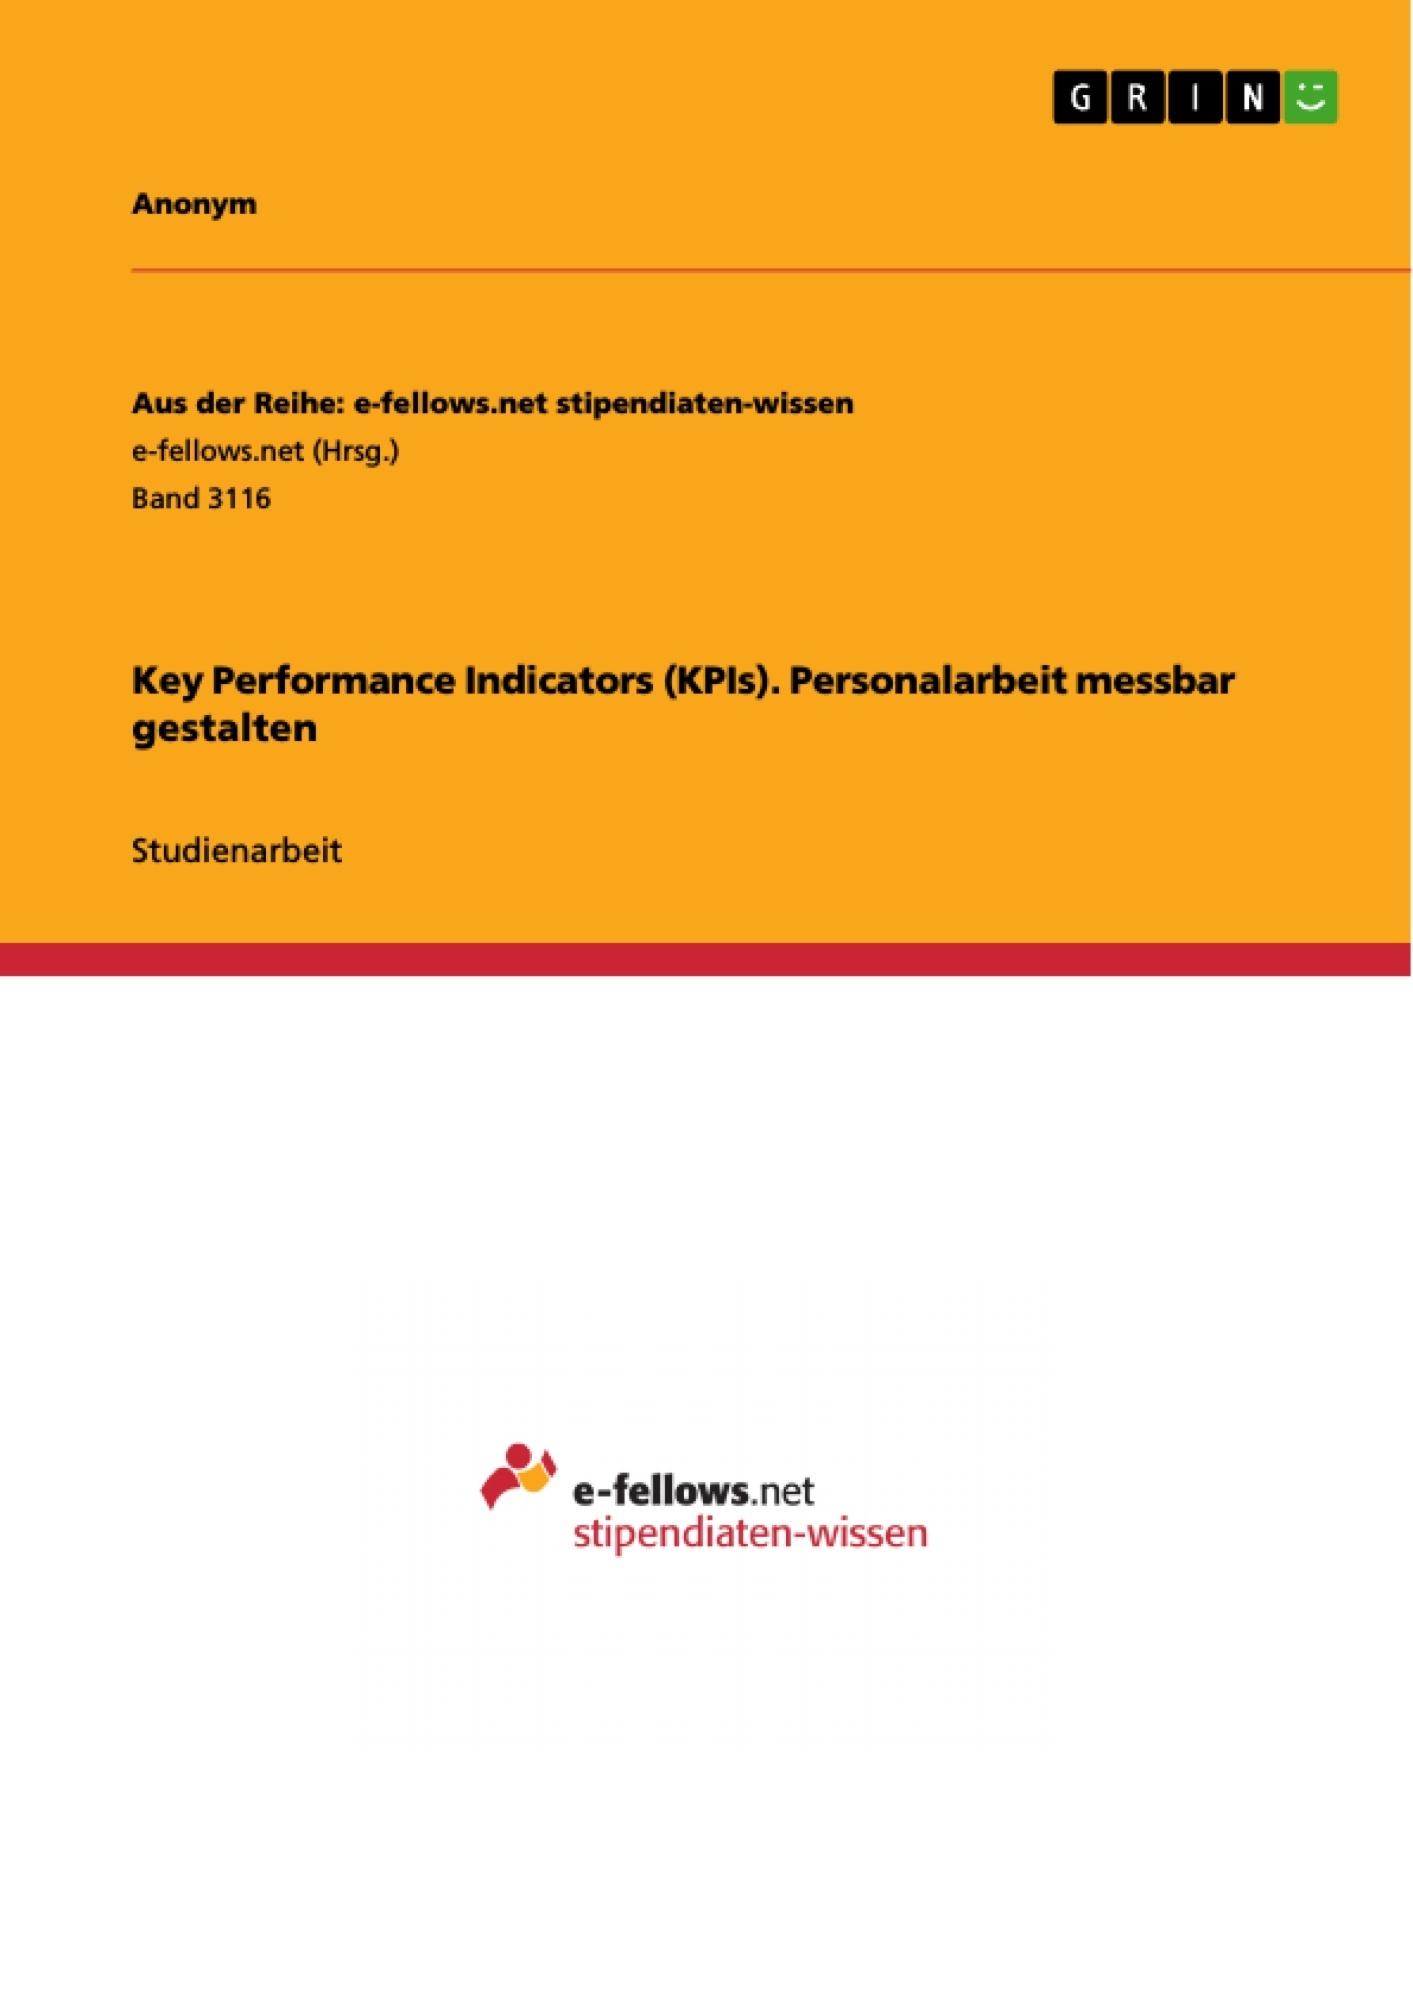 Titel: Key Performance Indicators (KPIs). Personalarbeit messbar gestalten